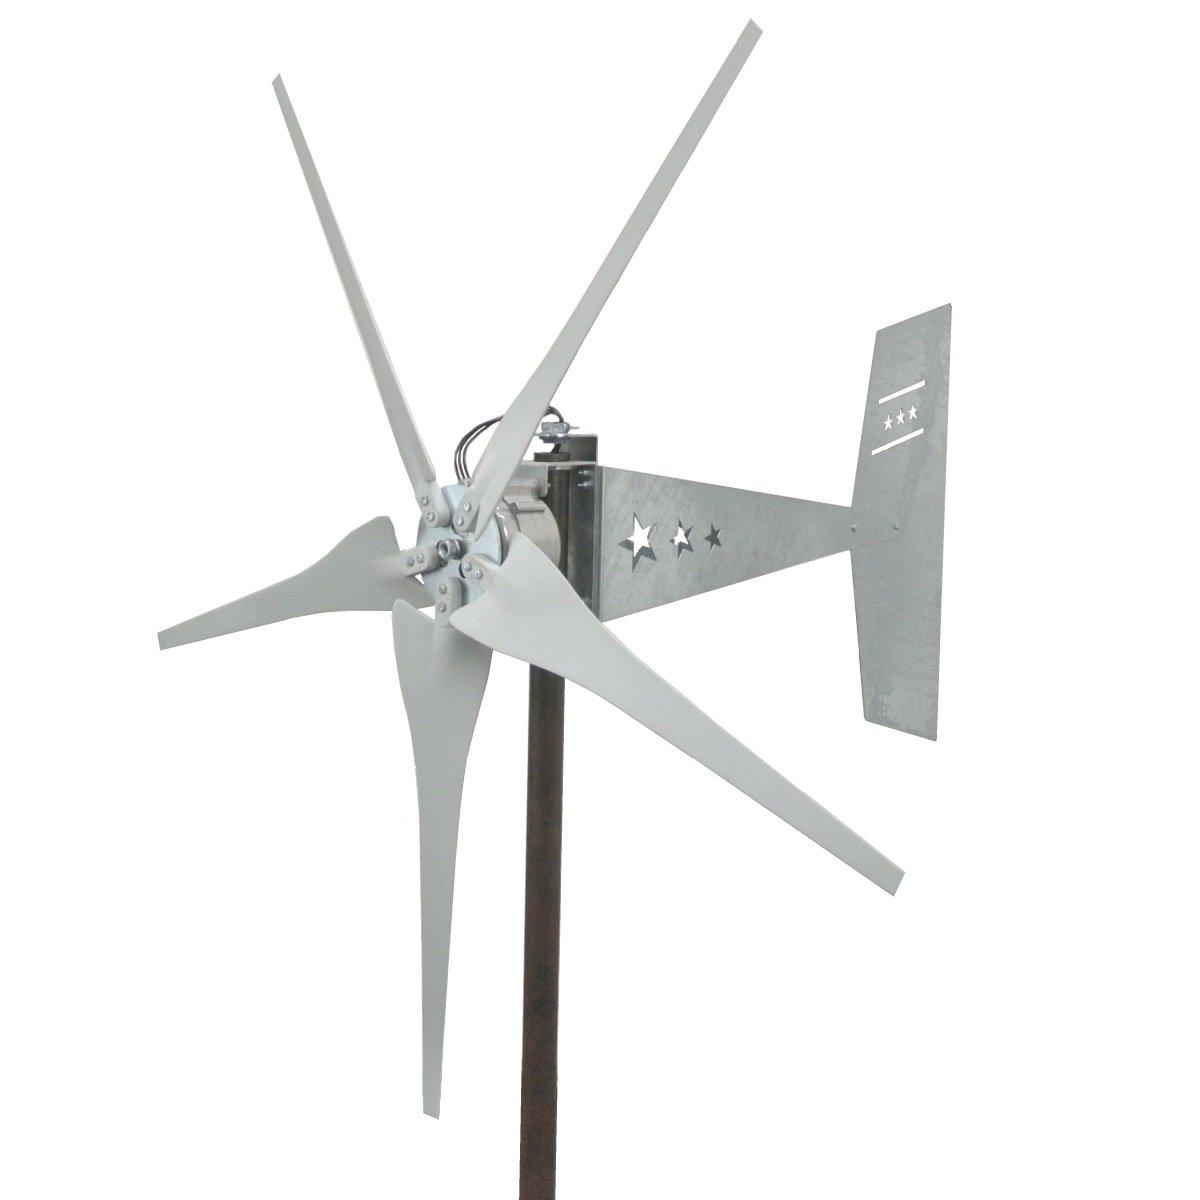 Amazon missouri freedom 5 blade wind turbine generator 12 amazon missouri freedom 5 blade wind turbine generator 12 volts garden outdoor pooptronica Choice Image